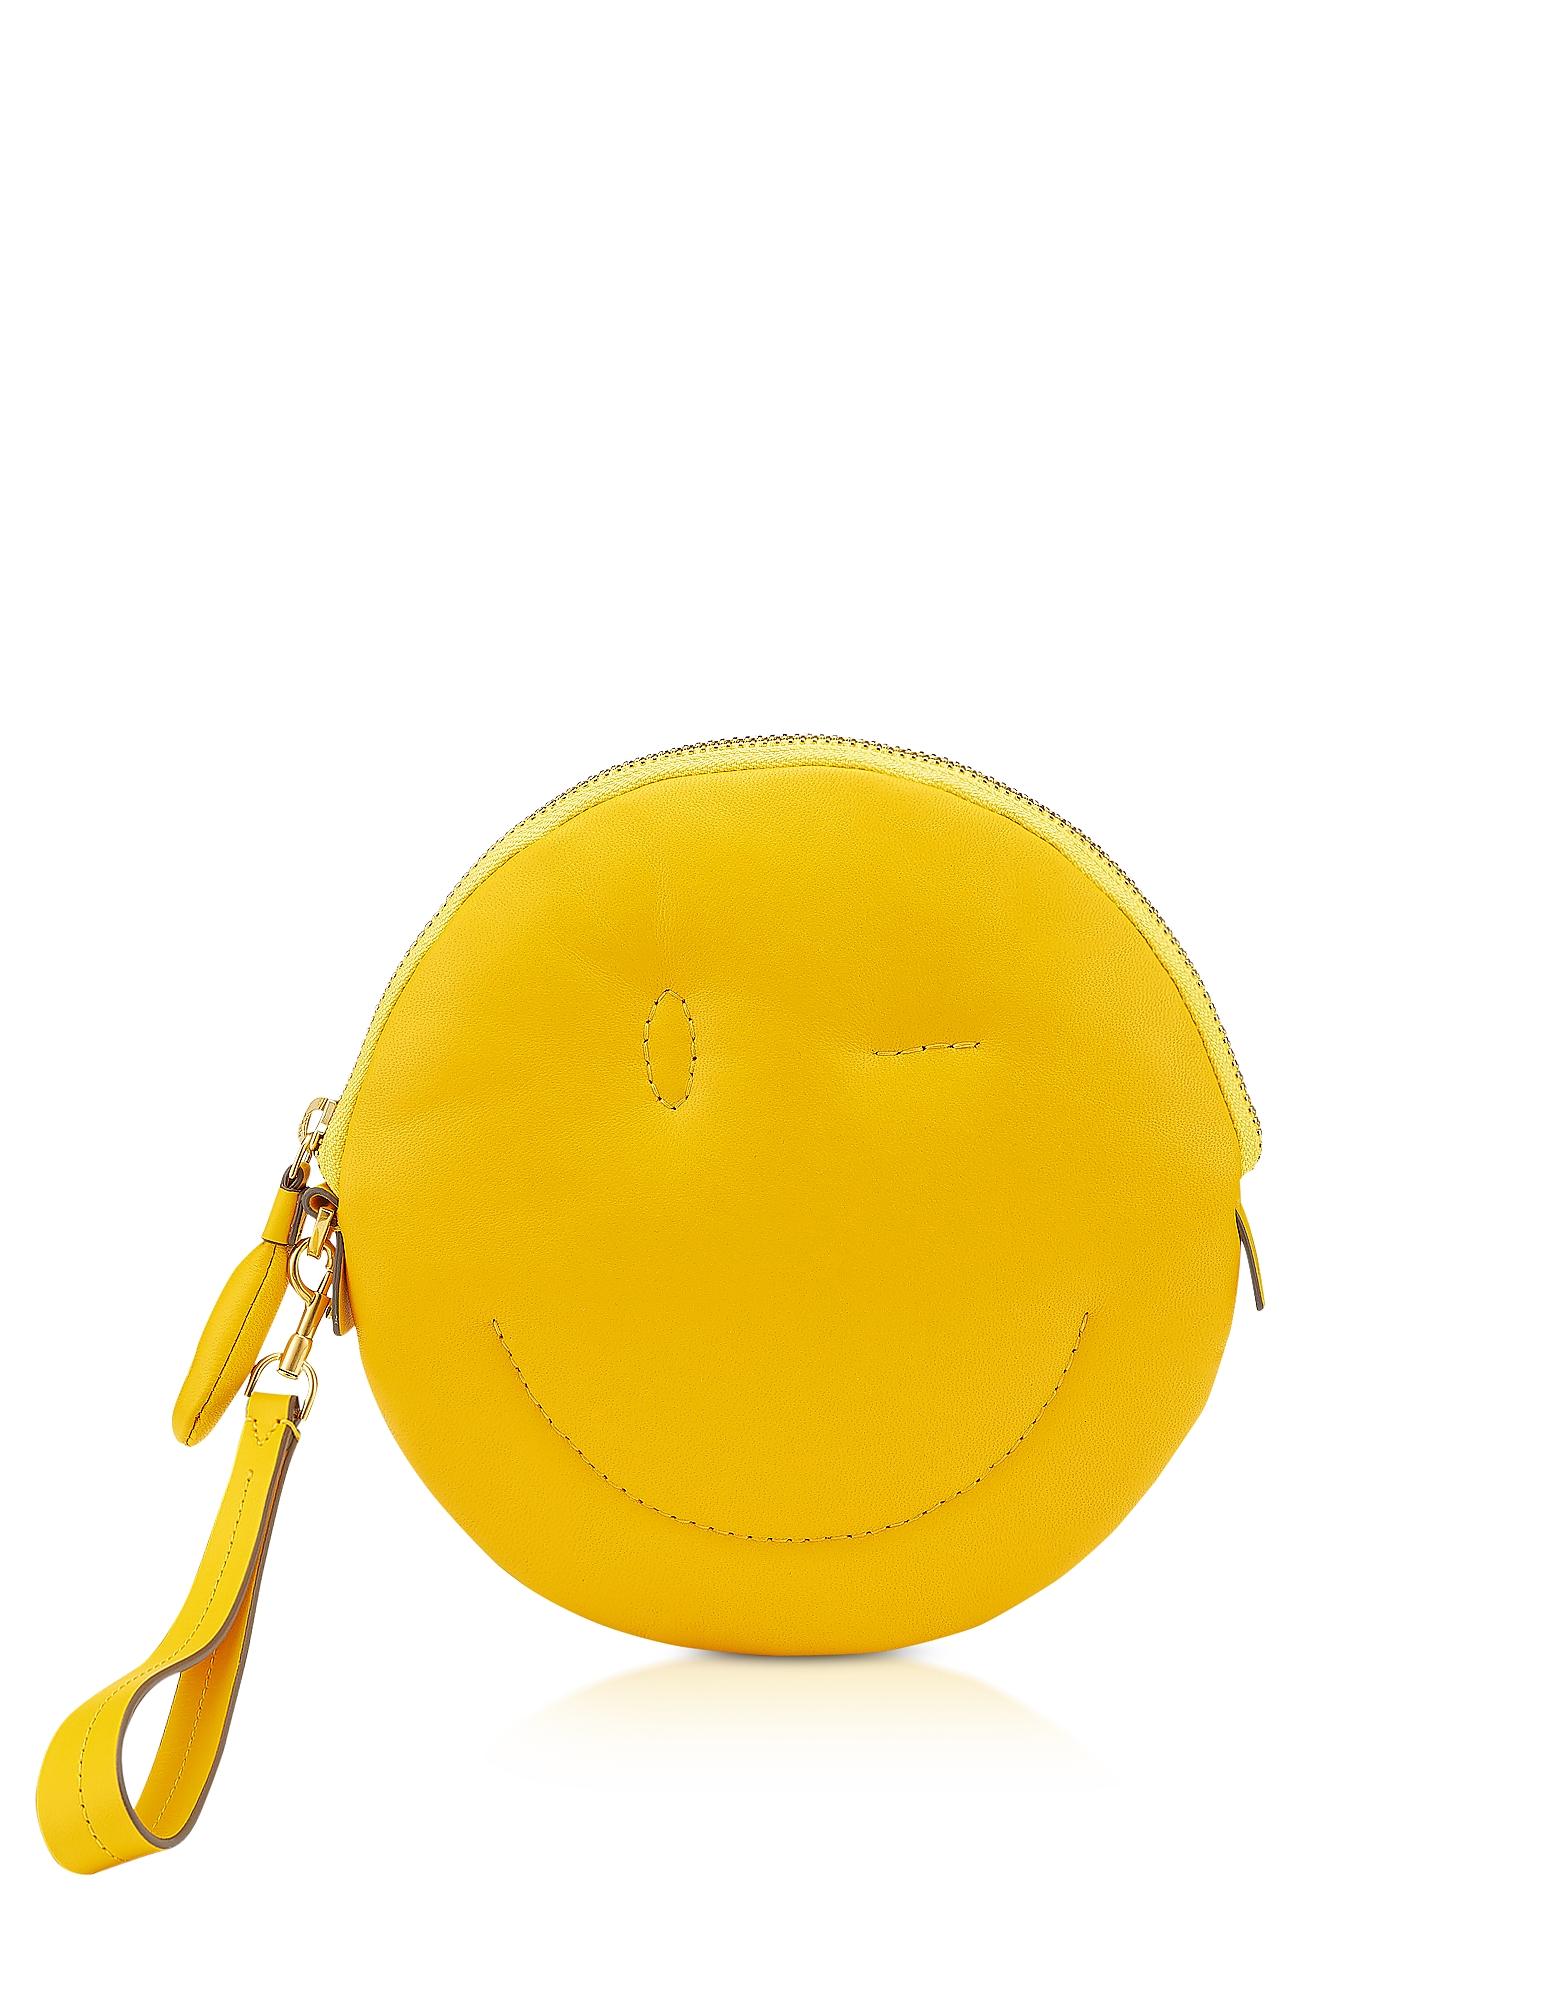 Anya Hindmarch Handbags, Soft Nappa Soleil Wink Chubby Clutch